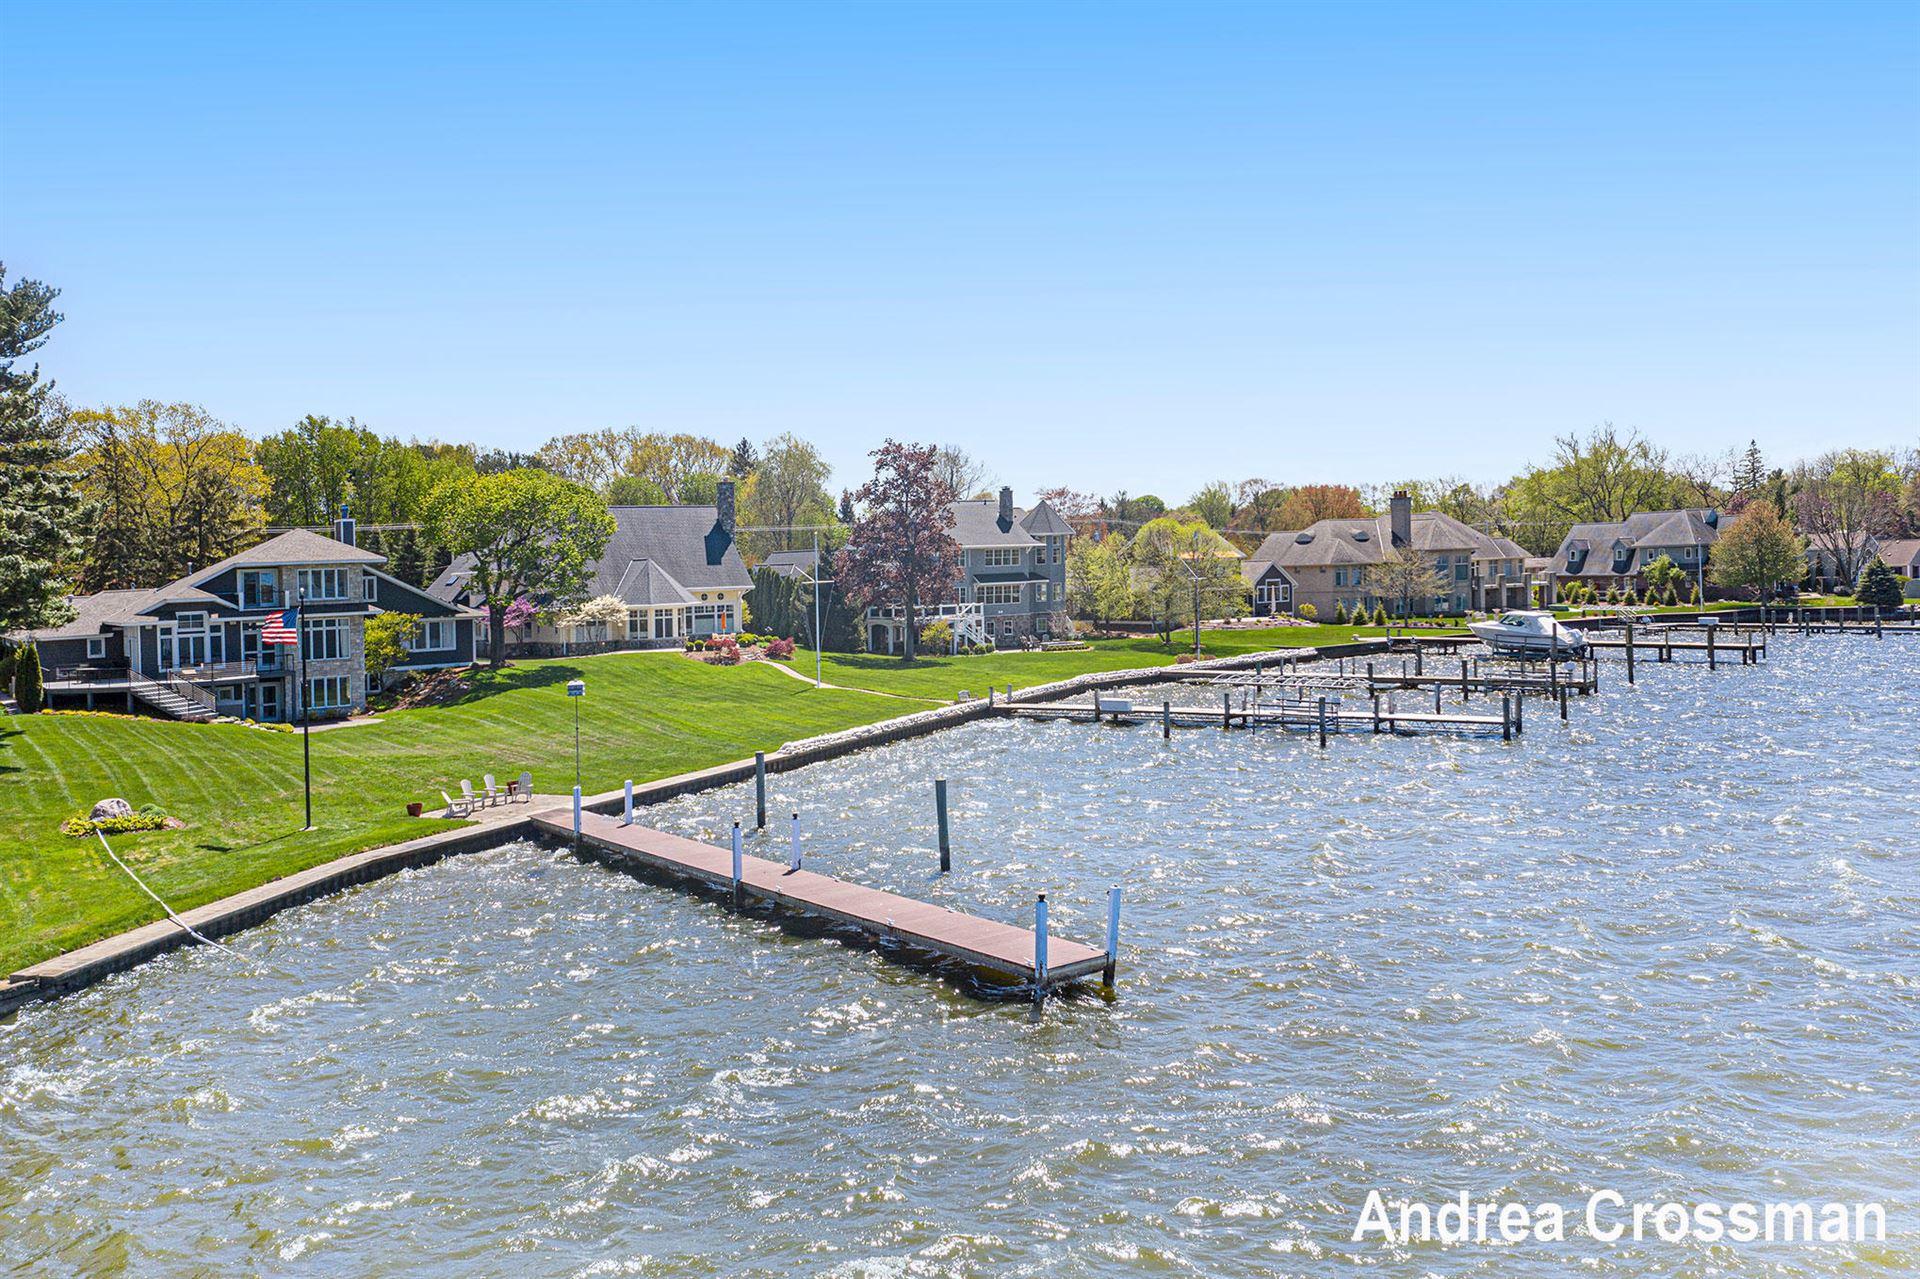 Photo of 753 South Shore Drive, Holland, MI 49423 (MLS # 21000271)